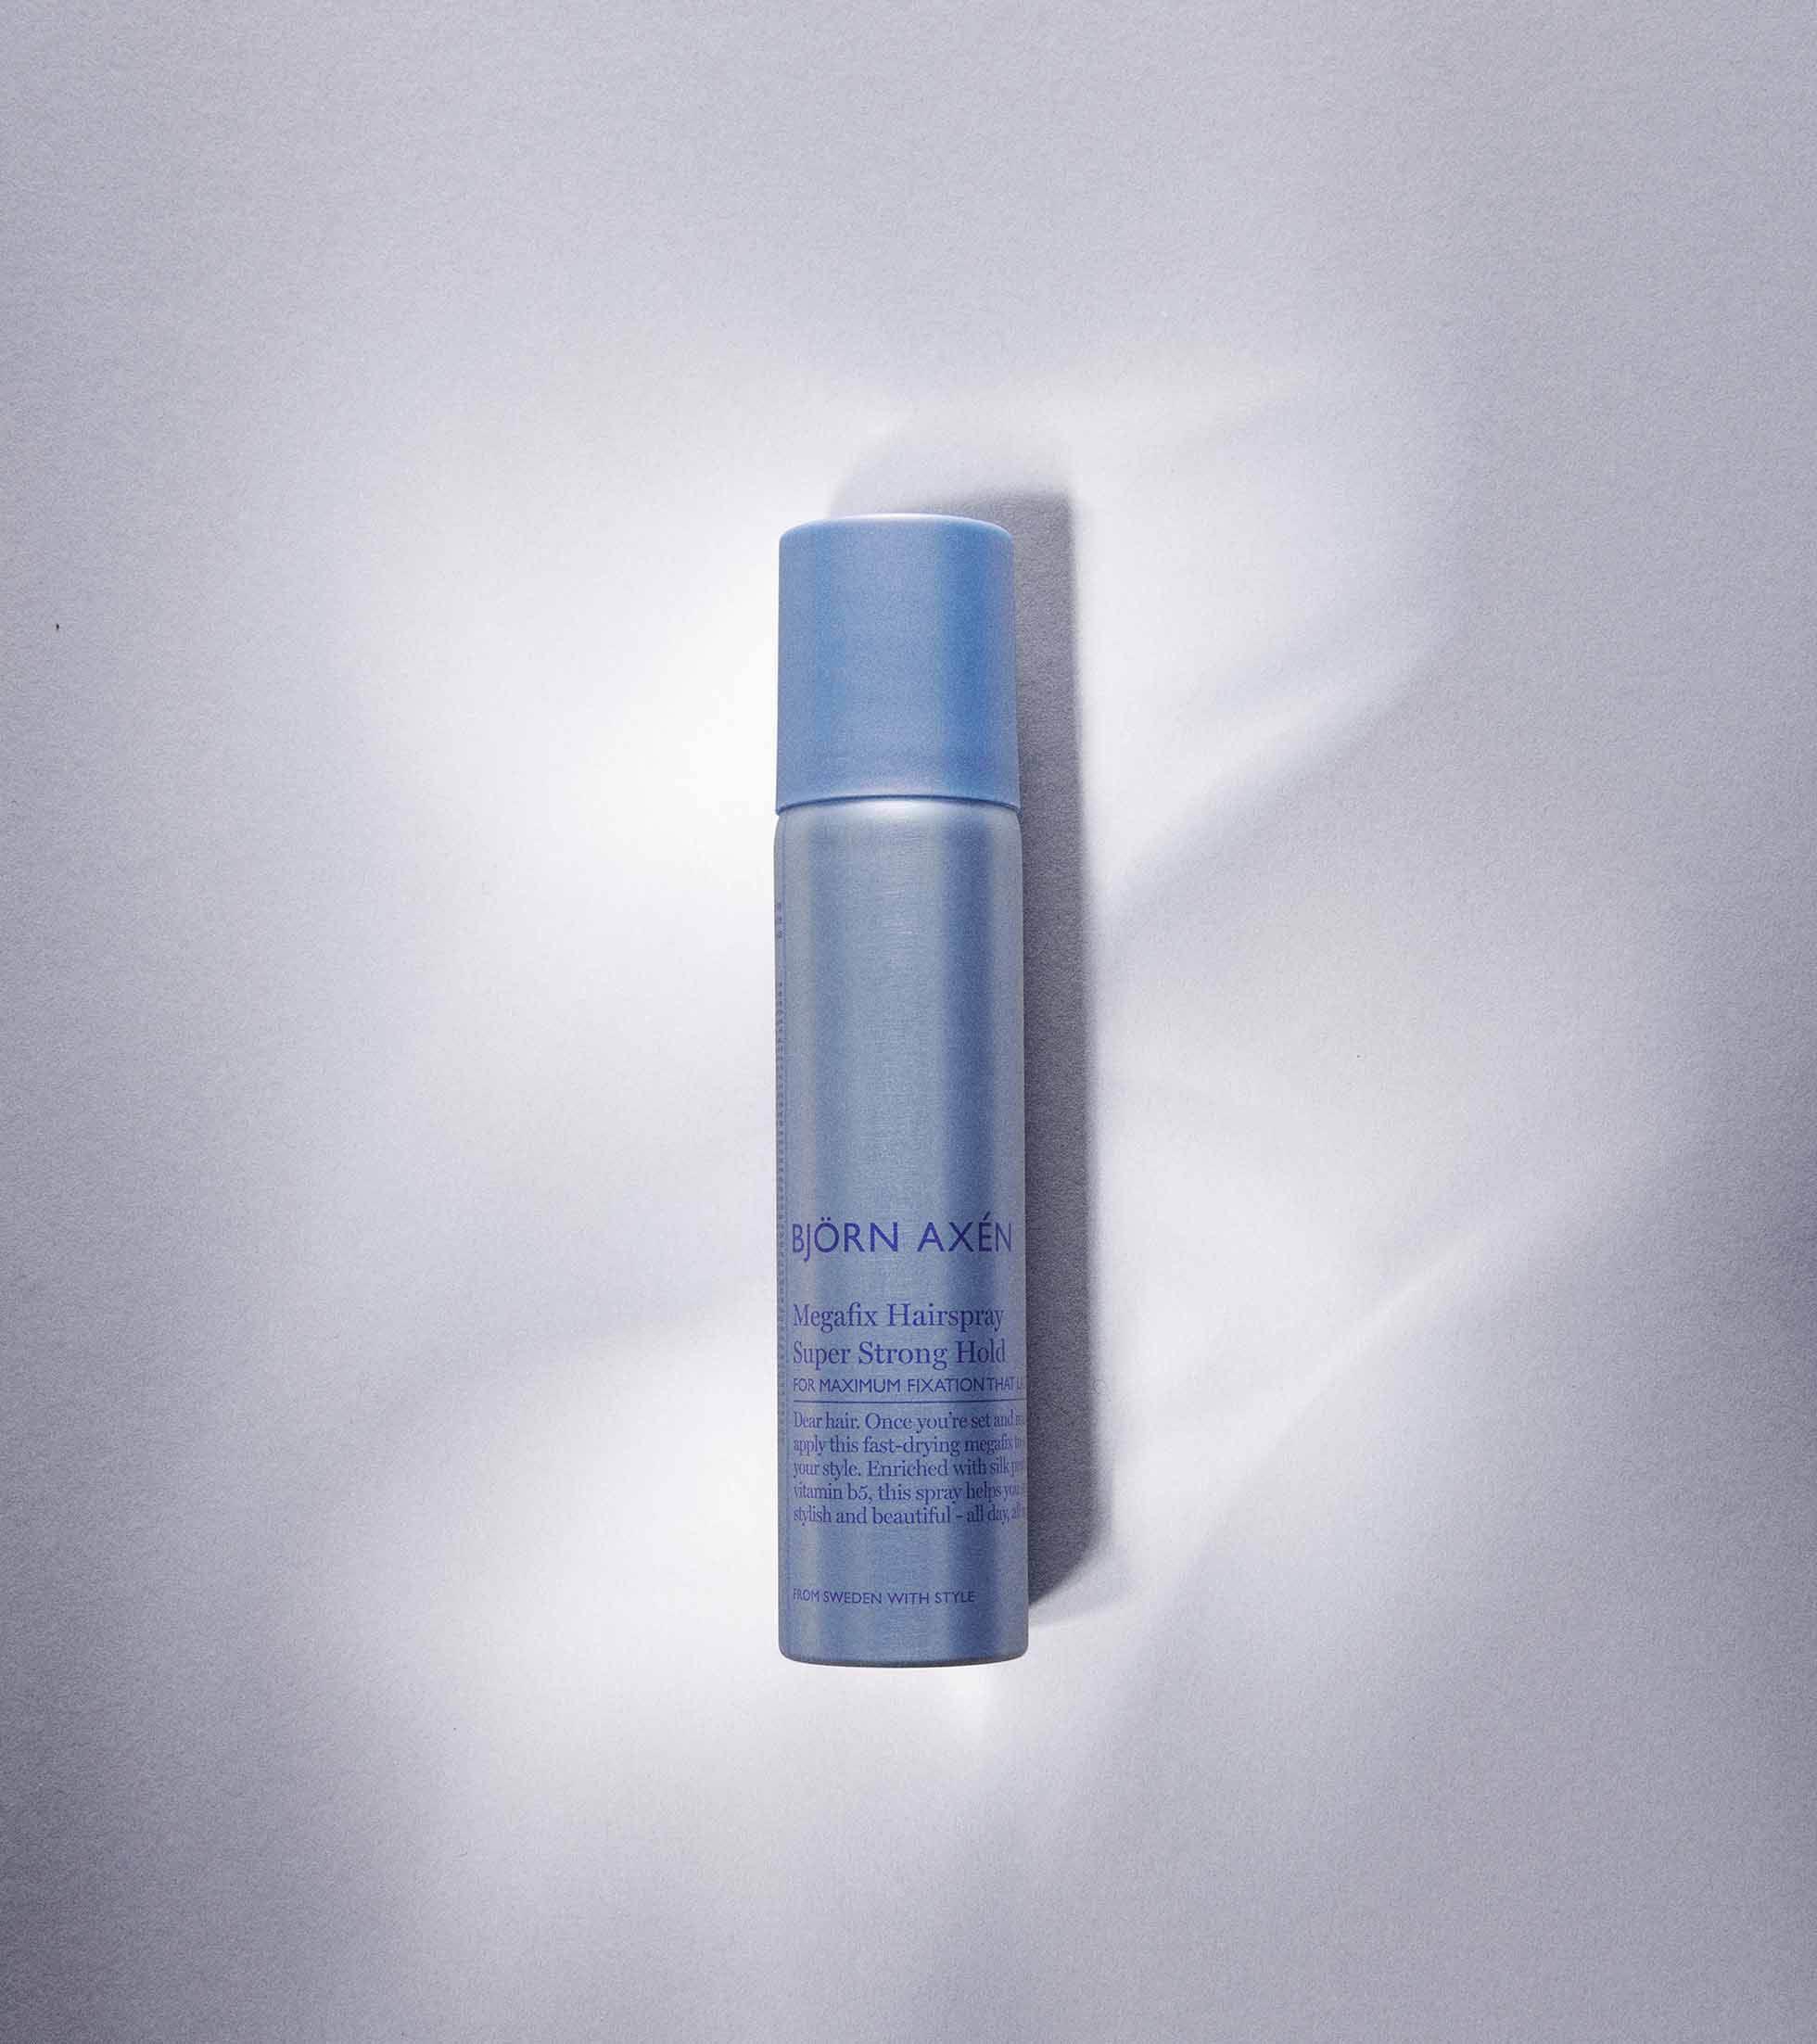 Megafix Hairspray travel size